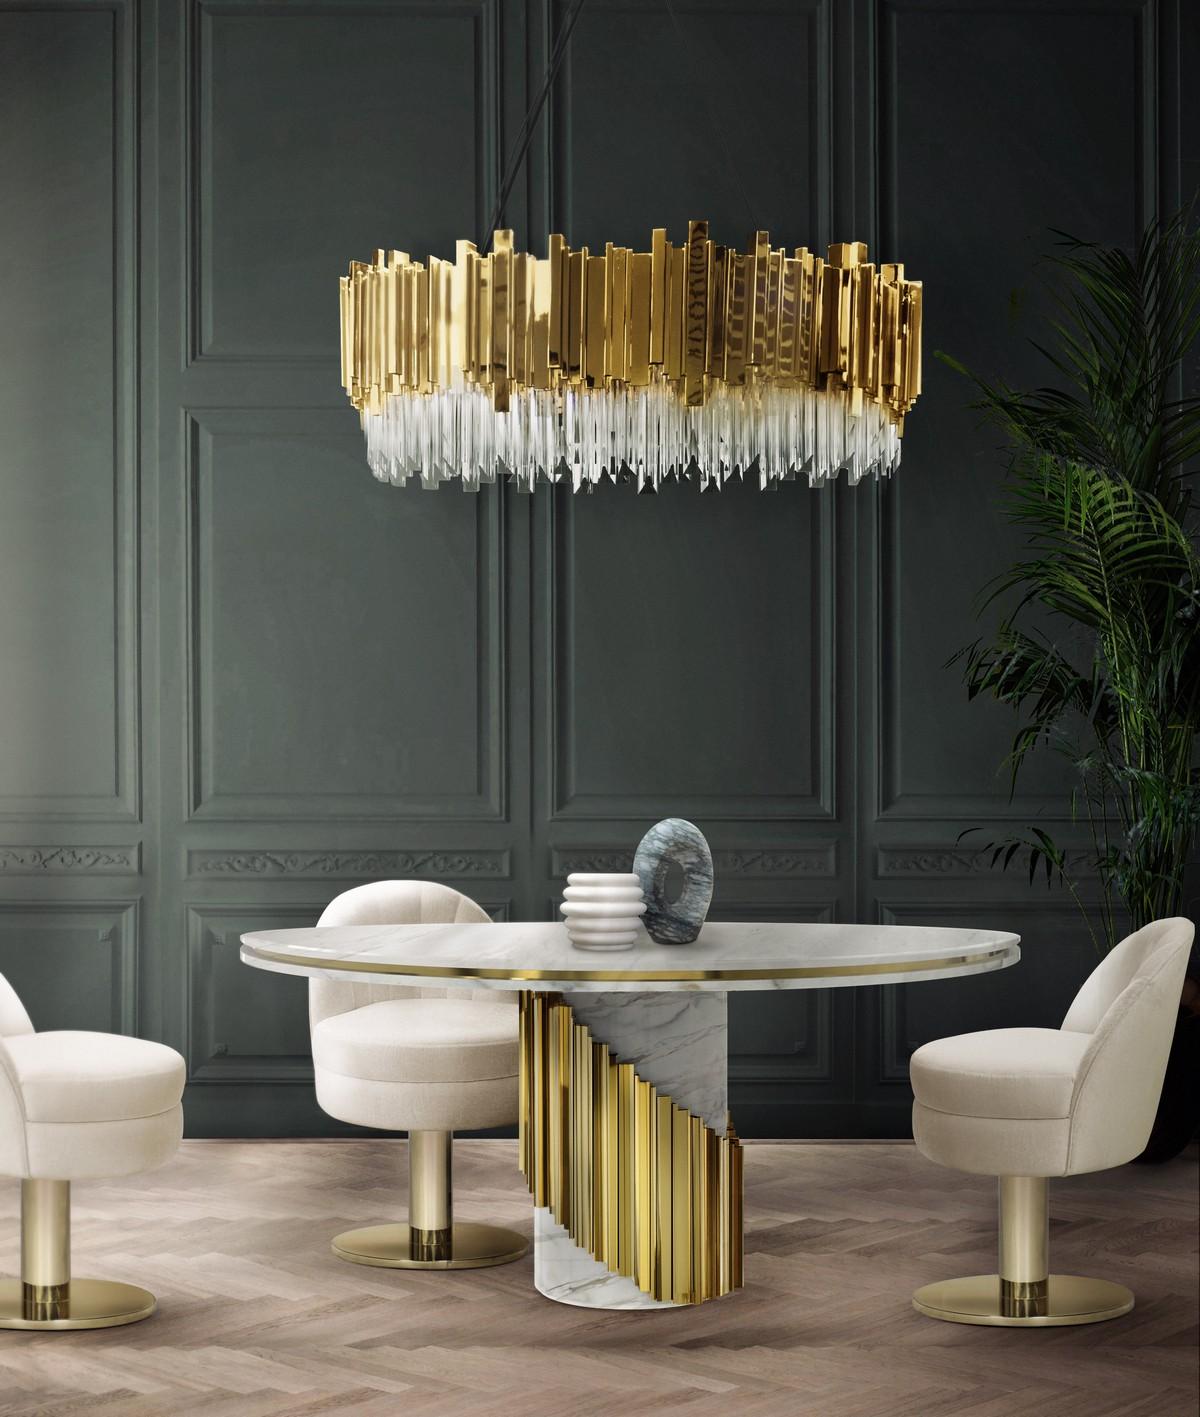 LUXURY DÉCOR IDEAS FOR THE LIVING ROOM  Luxury Décor Ideas for the Living Room littus diningtable